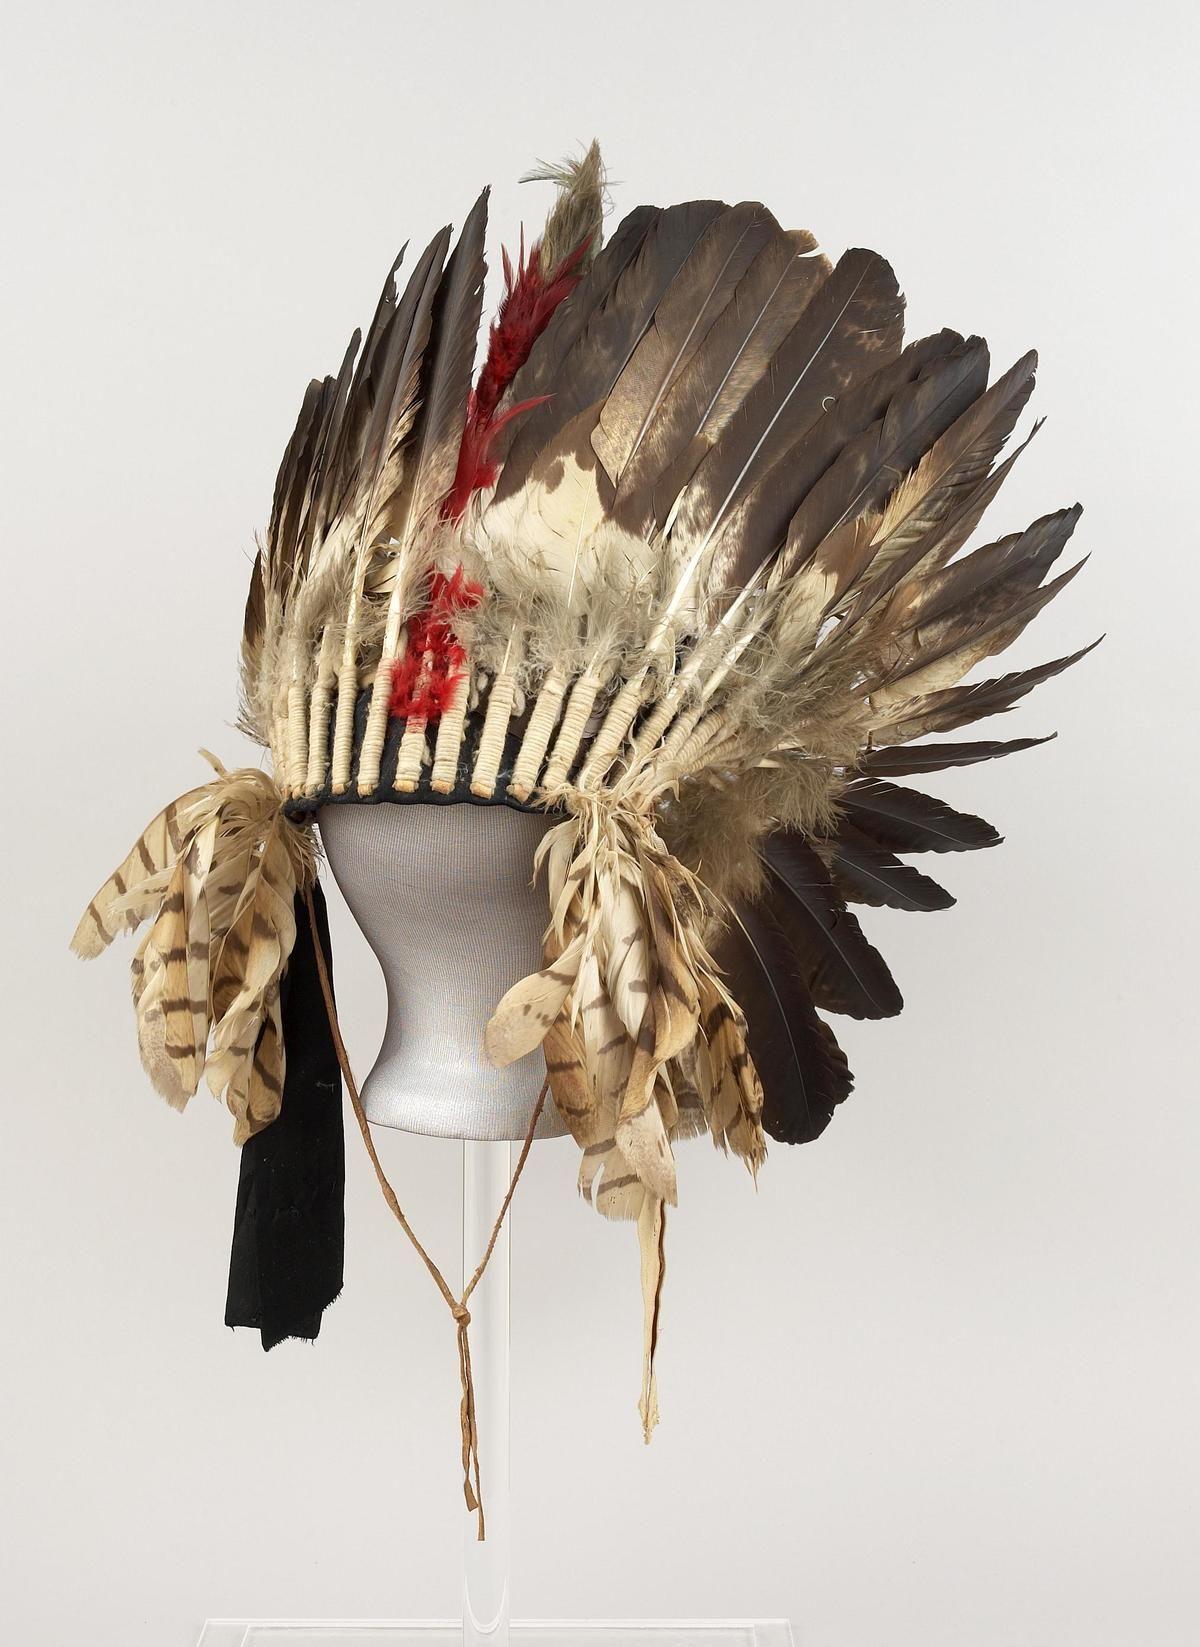 War Bonnet Northern Plains Eagle Plumes Black Feathers Yarn Hackle White Hawk Ribbons Native American Artifacts War Bonnet Native American Headdress